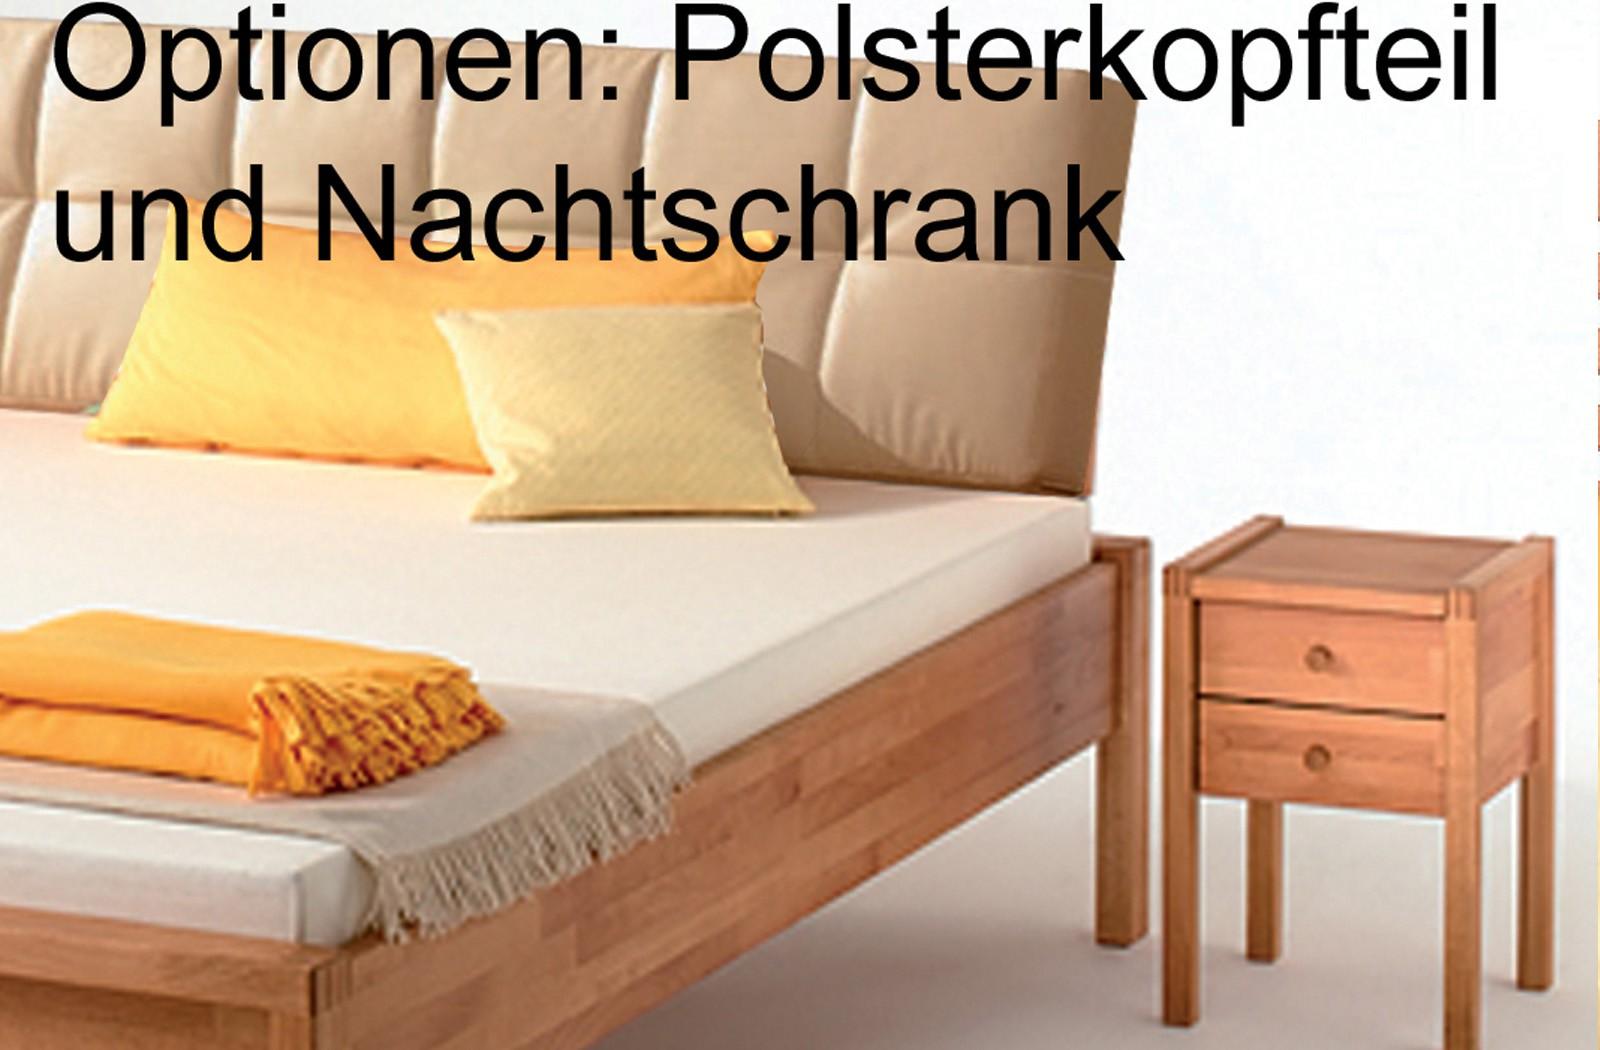 massivholzbett buche ge lt bett holzbett massiv doppelbett komforth he ferdinand ebay. Black Bedroom Furniture Sets. Home Design Ideas